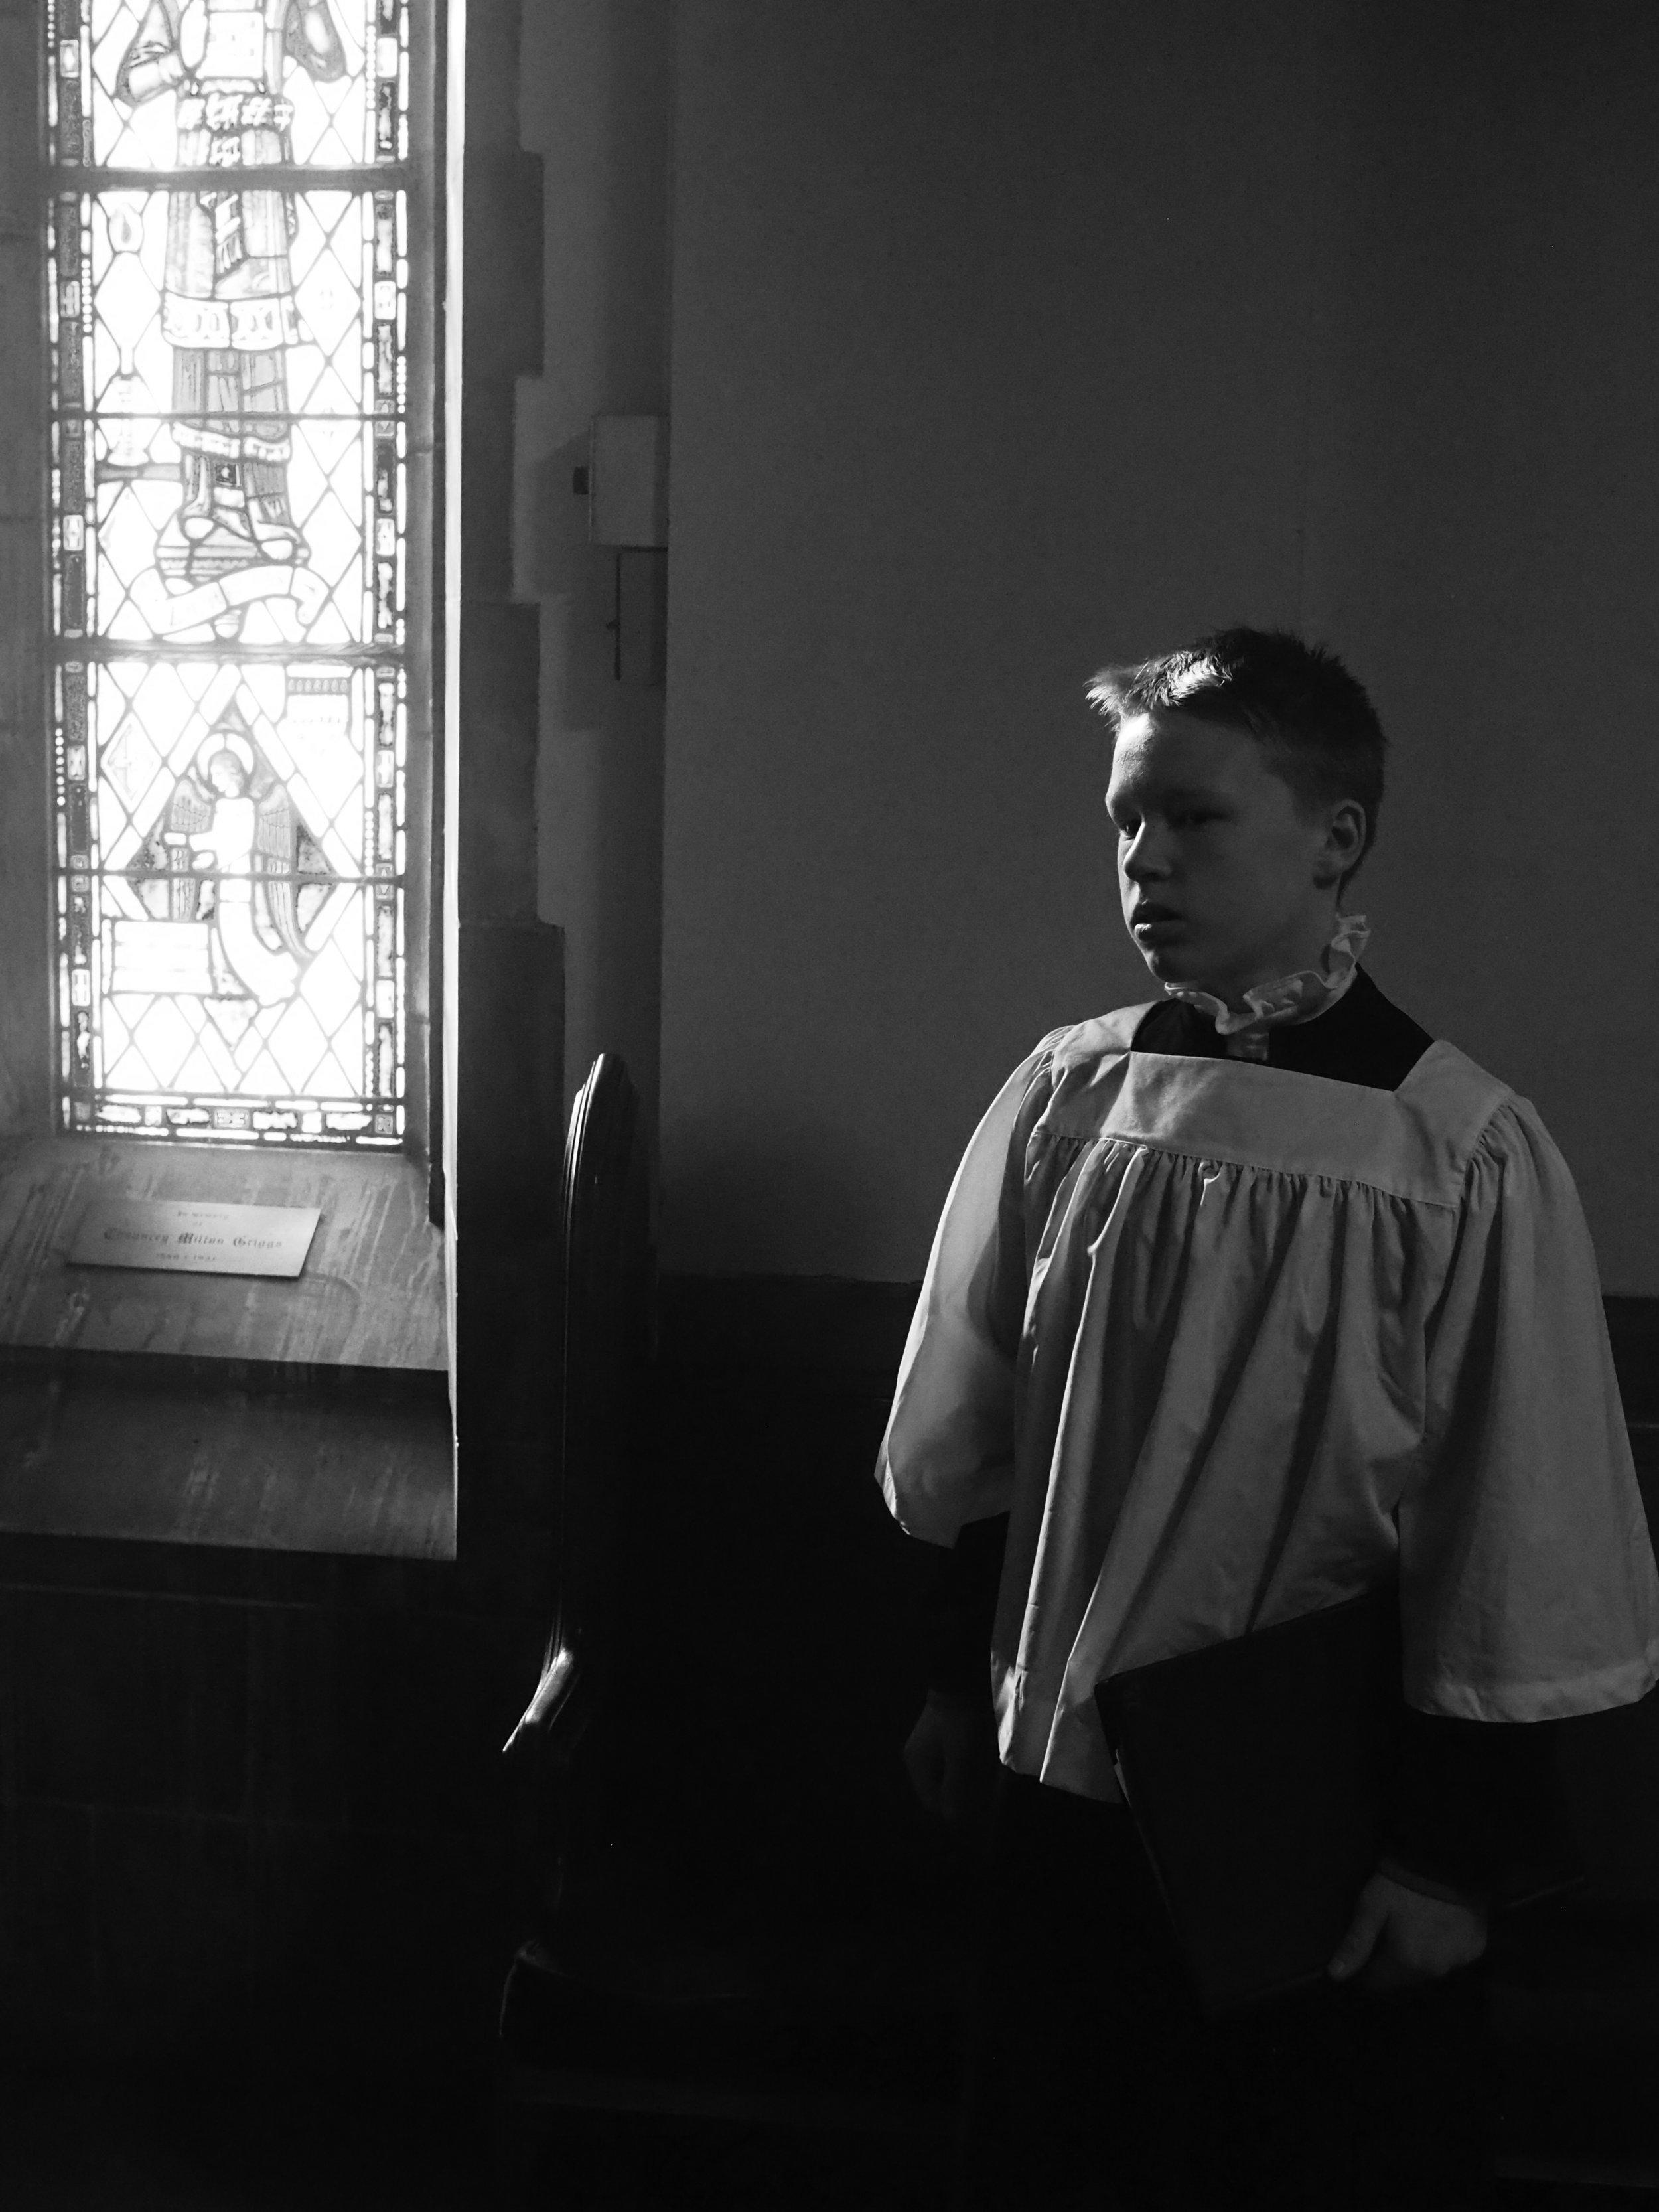 Chorister. Saint Paul, MN.